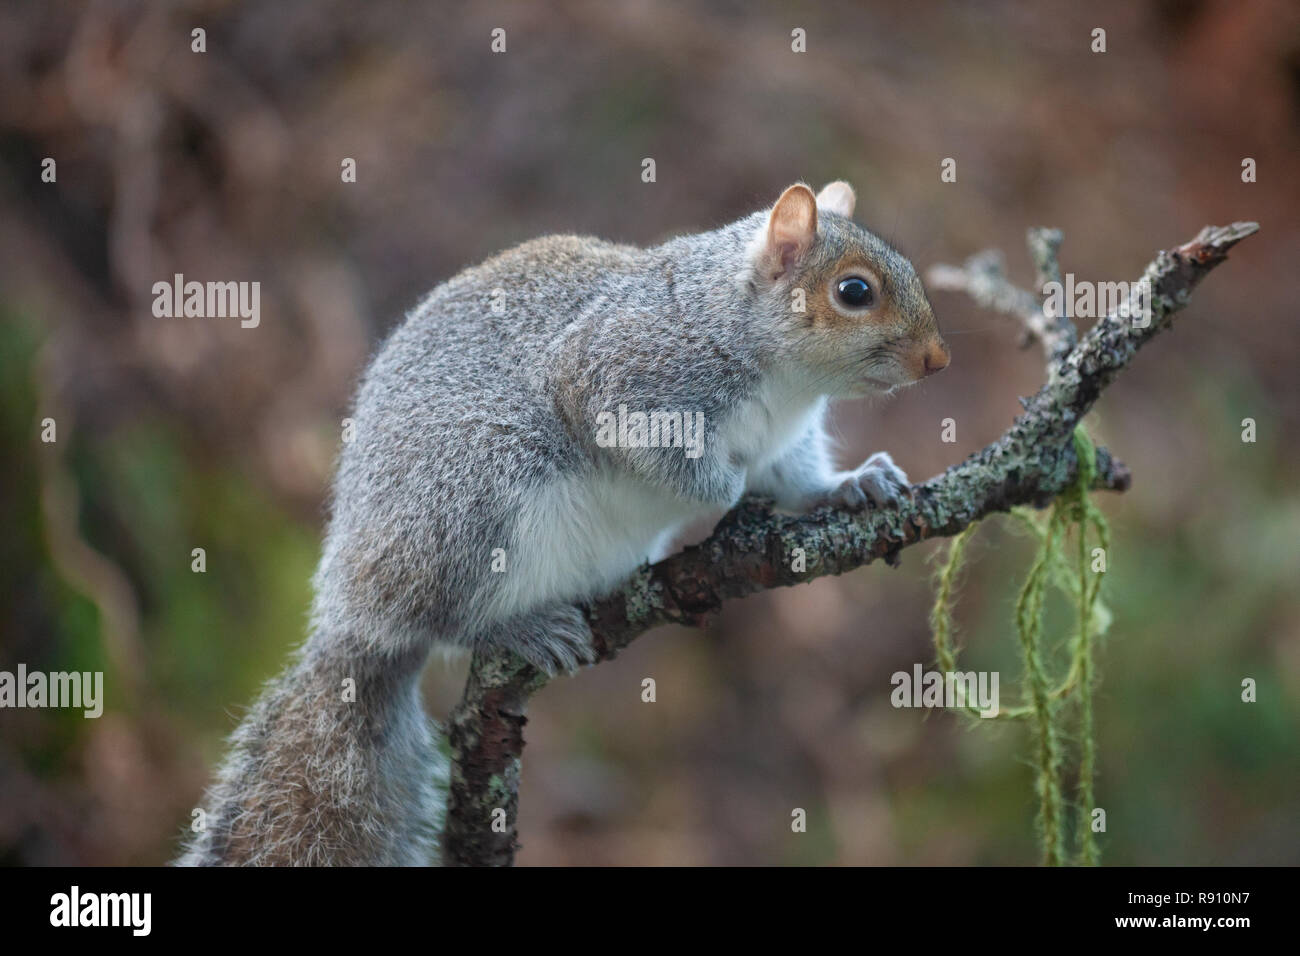 Eastern Grey Squirrel Sciurus carolinensis on a branch in a Scottish Garden. - Stock Image